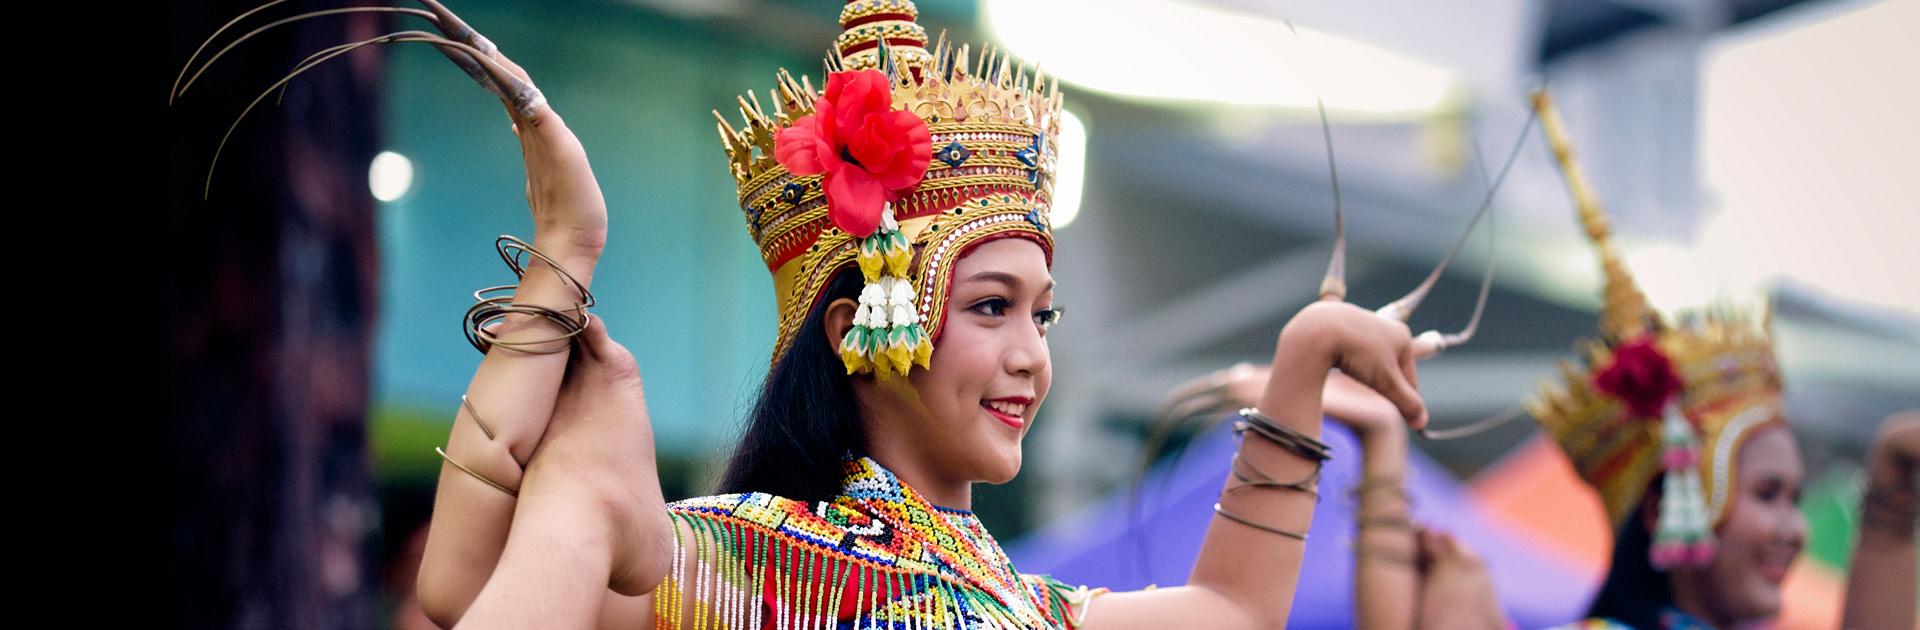 TH Bangkok y Krabi 10 días 3